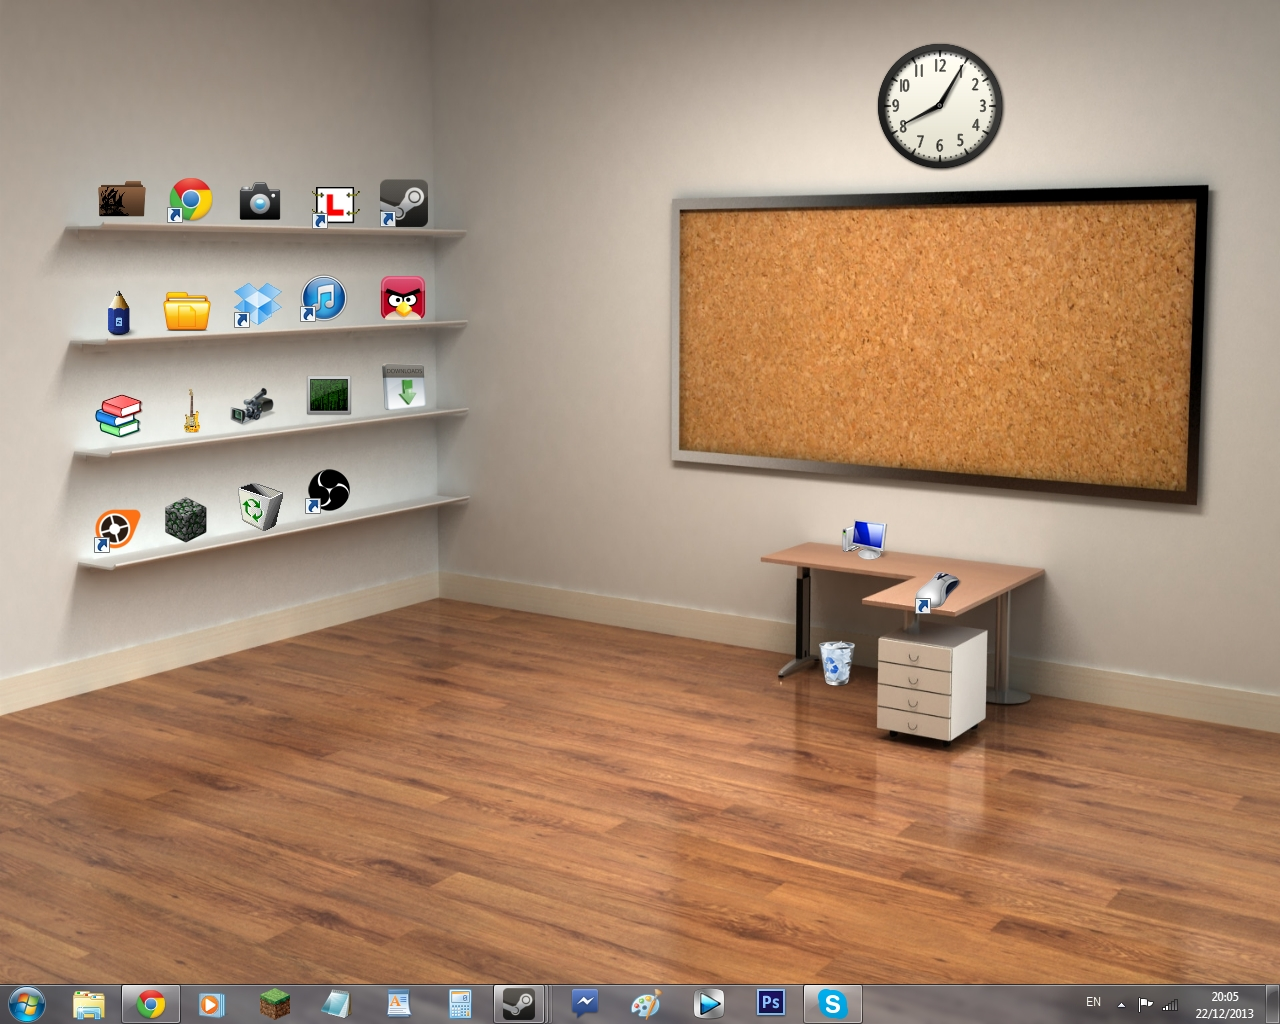 Free-desktop-background-with-shelves-Download-Download-desktop-background-with-shelves-HD-Downl-wallpaper-wp3605823